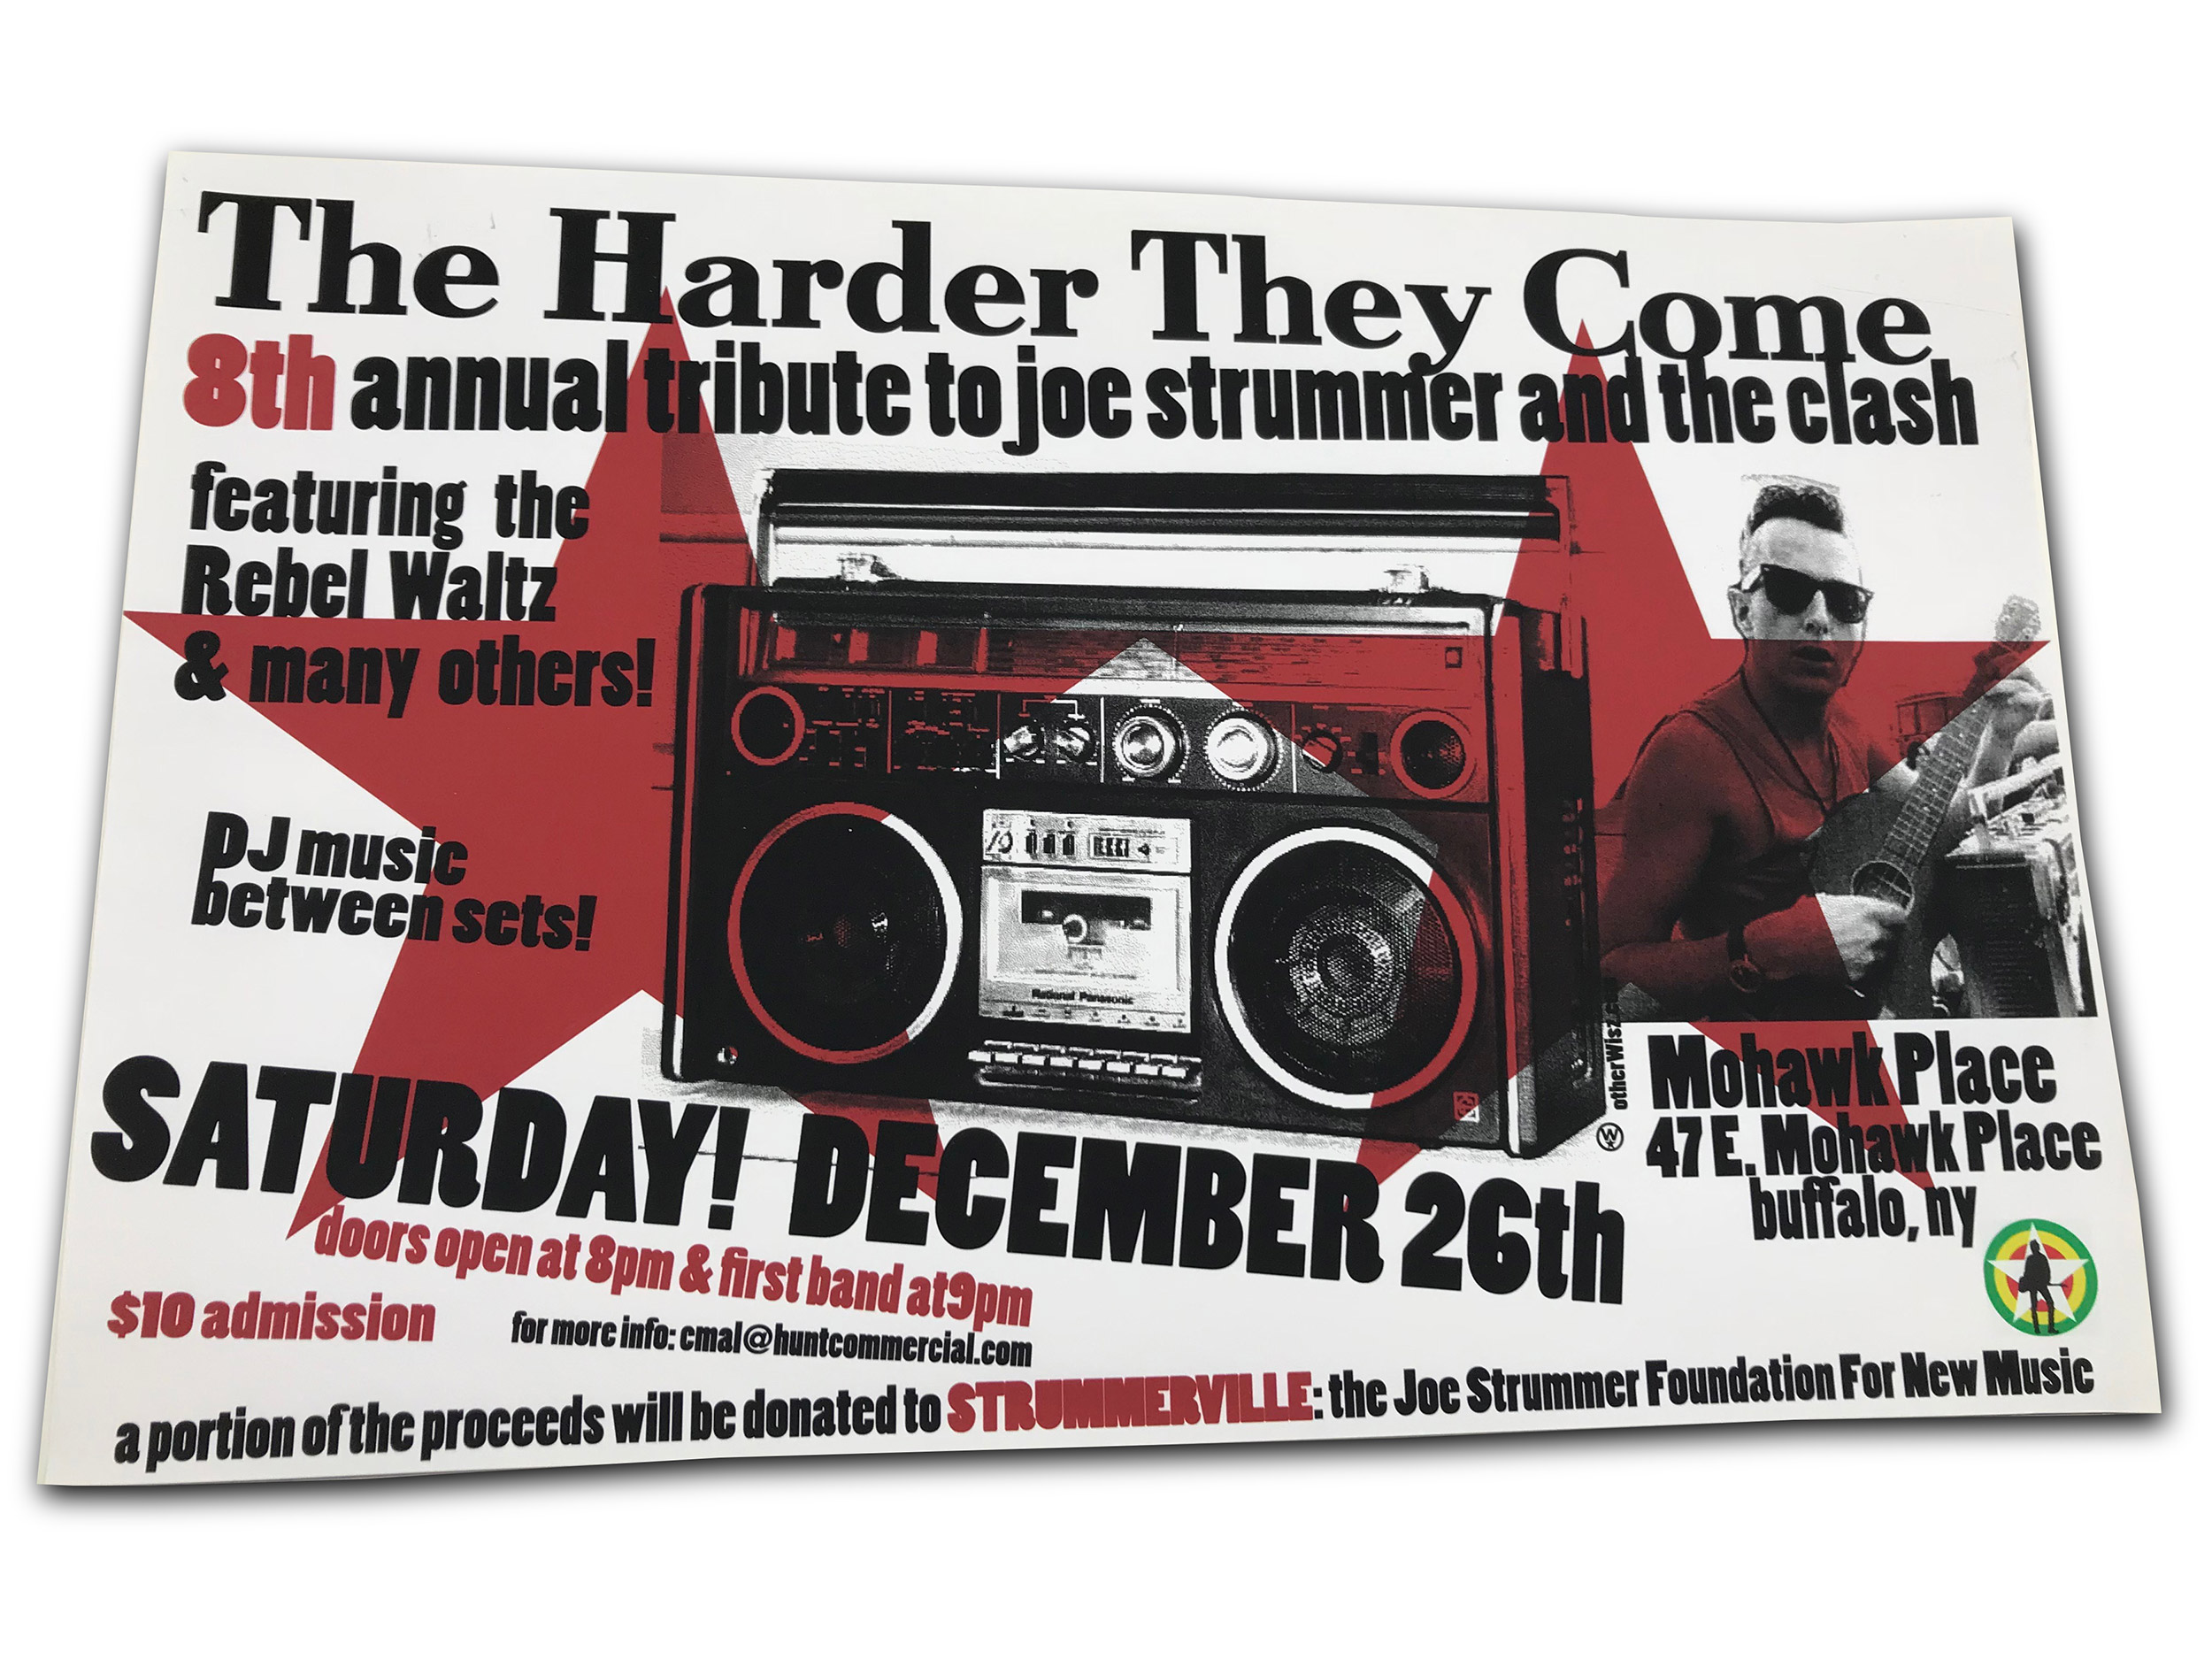 strummer tribute, clash, buffalo ny, mohawk place, mark wisz, poster design